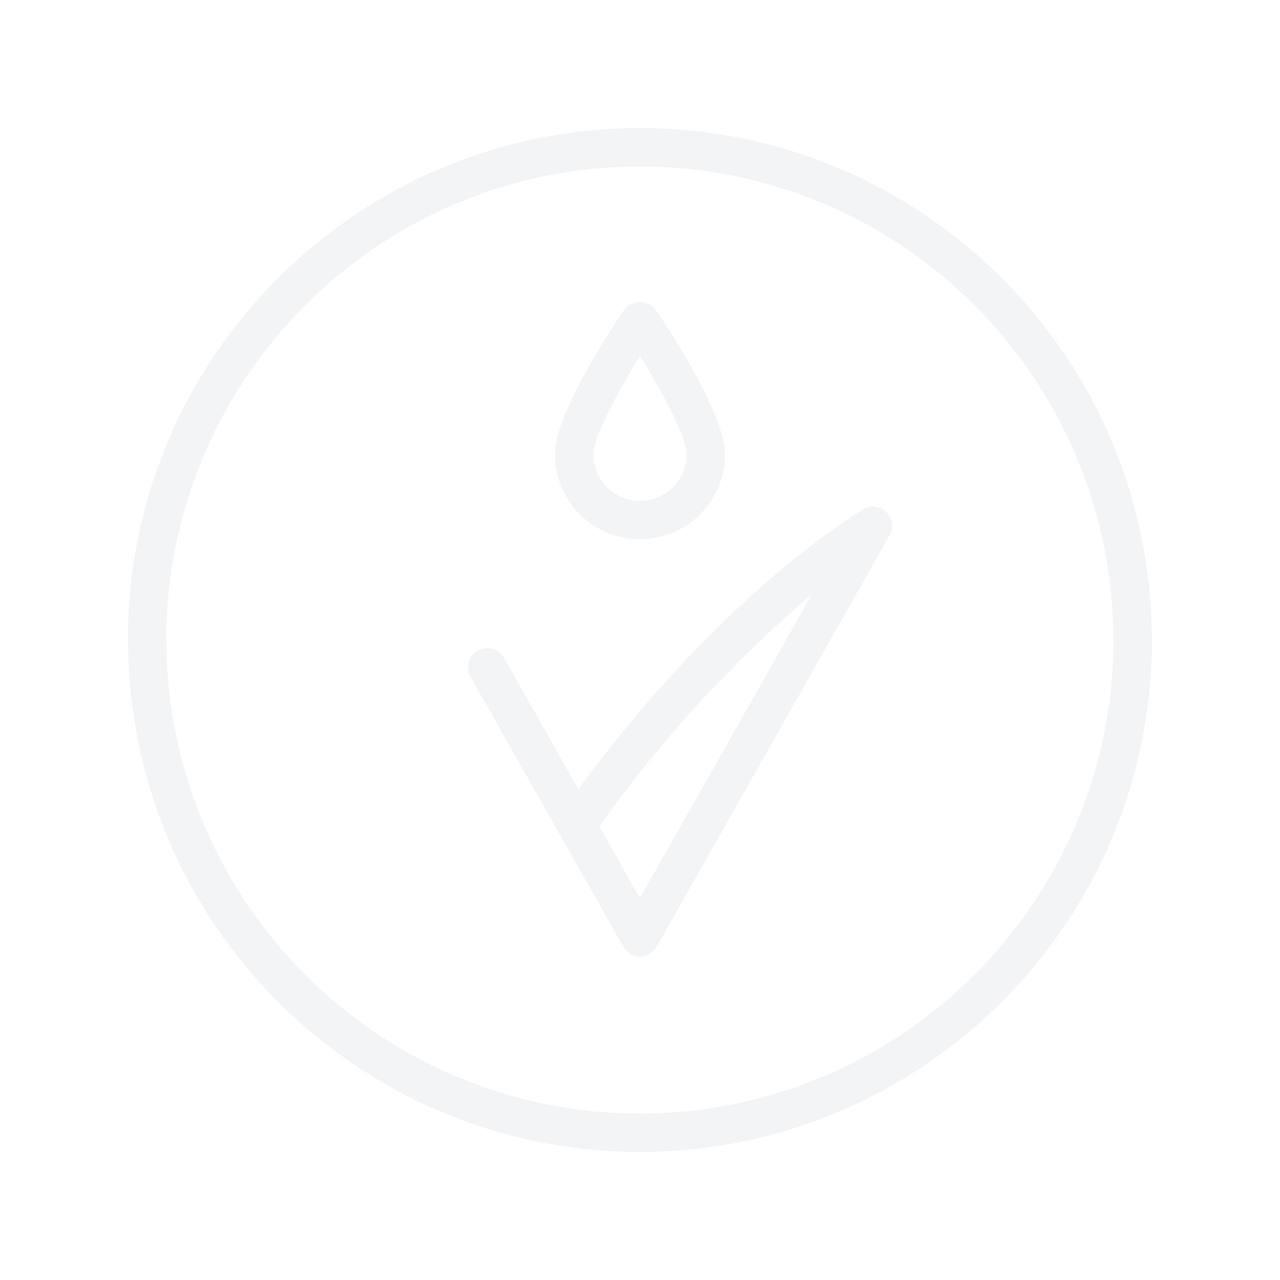 KARL LAGERFELD Bois De Yuzu Deodorant Stick 75g